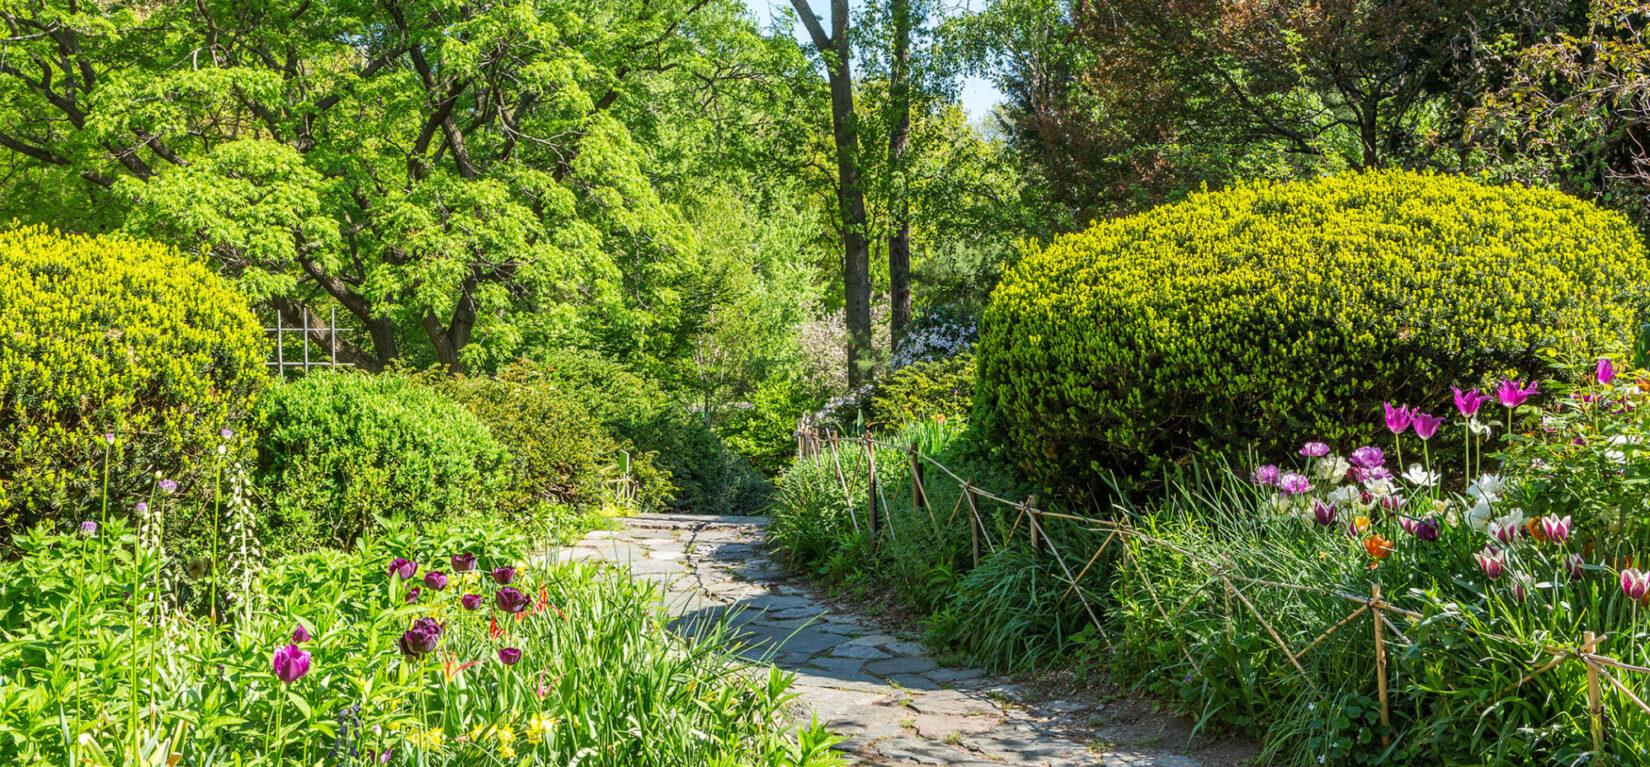 Shakespeare Garden on a sunny spring day